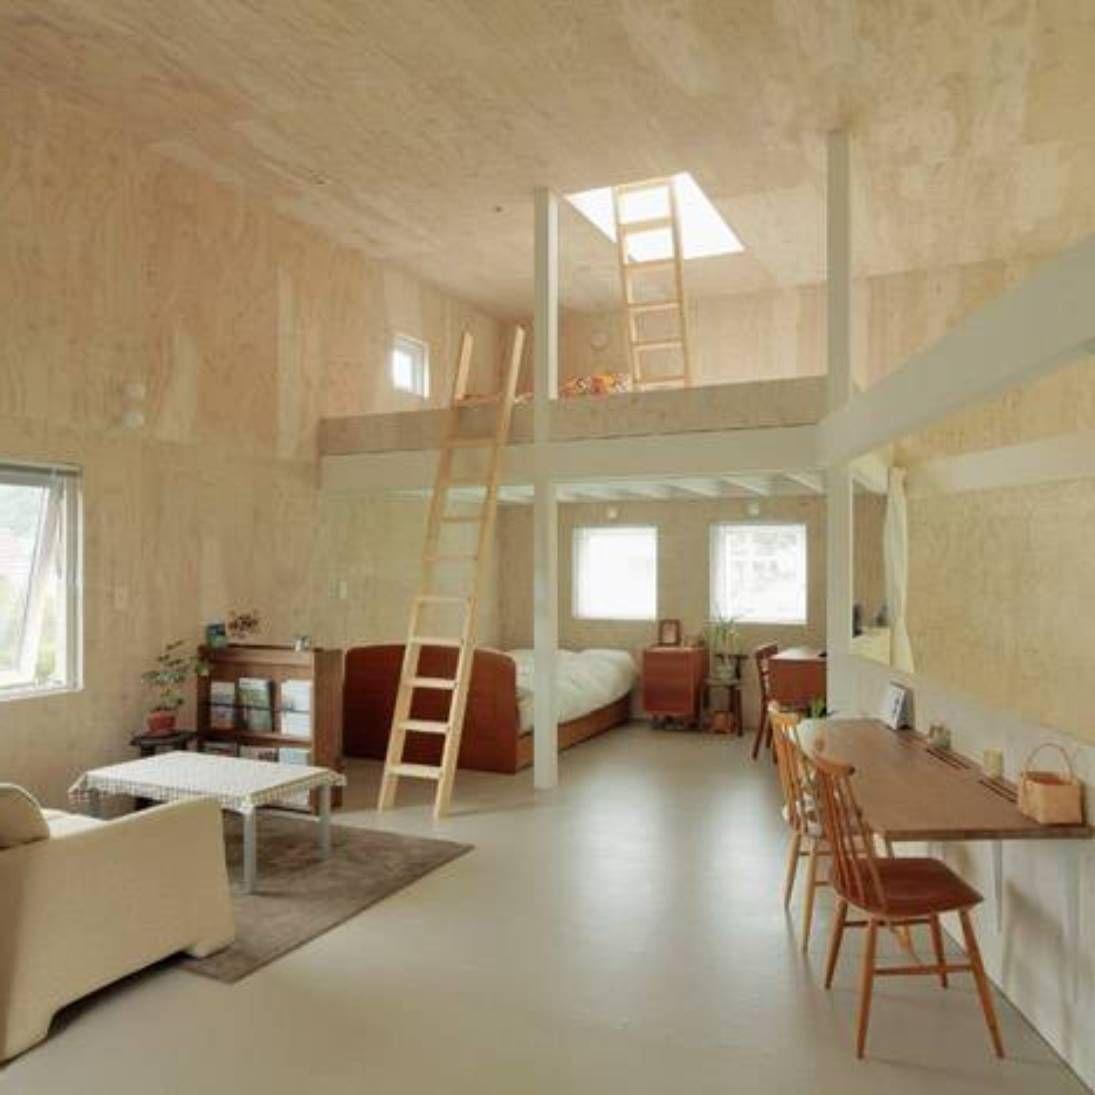 Unique Design Plans For A Small House : Interior Design Plans For A Small  House U2013